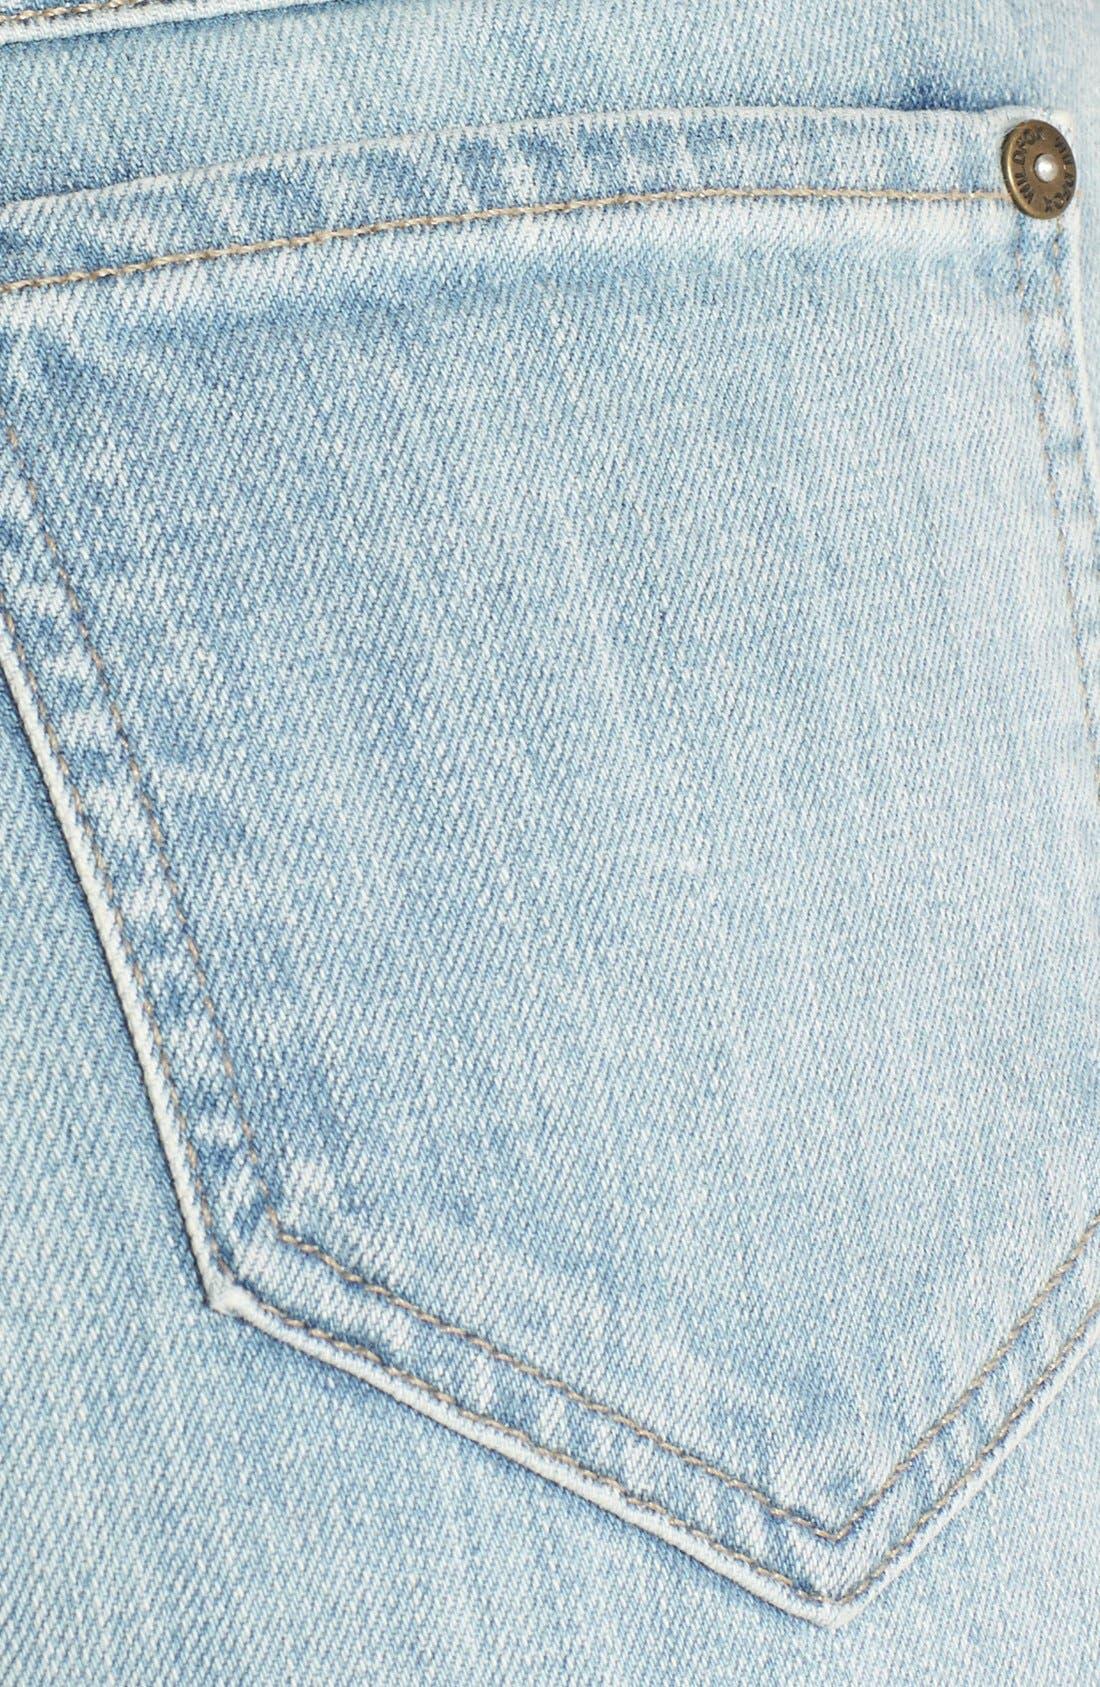 Alternate Image 3  - Wildfox 'Luca' High Rise Straight Leg Jeans (Faithful)